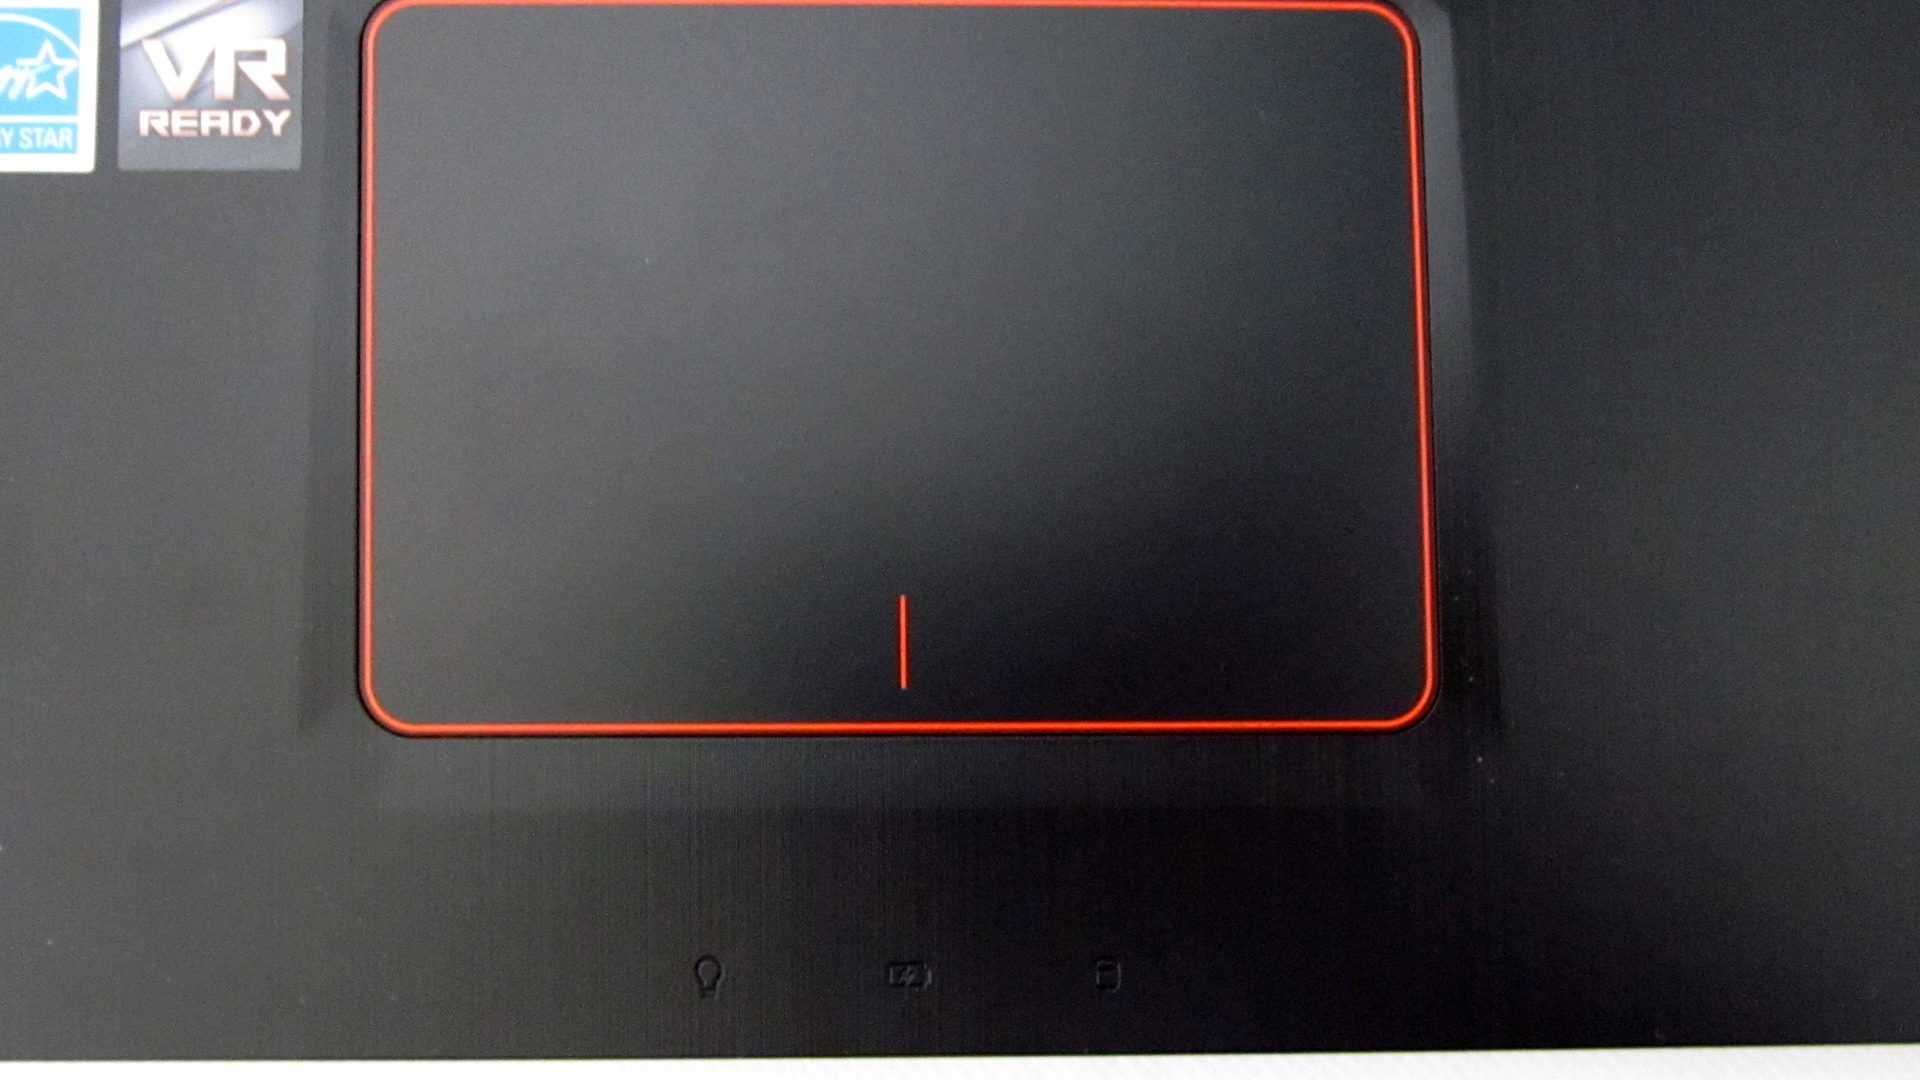 Asus-GL702VM-GC017T-Tastatur_5